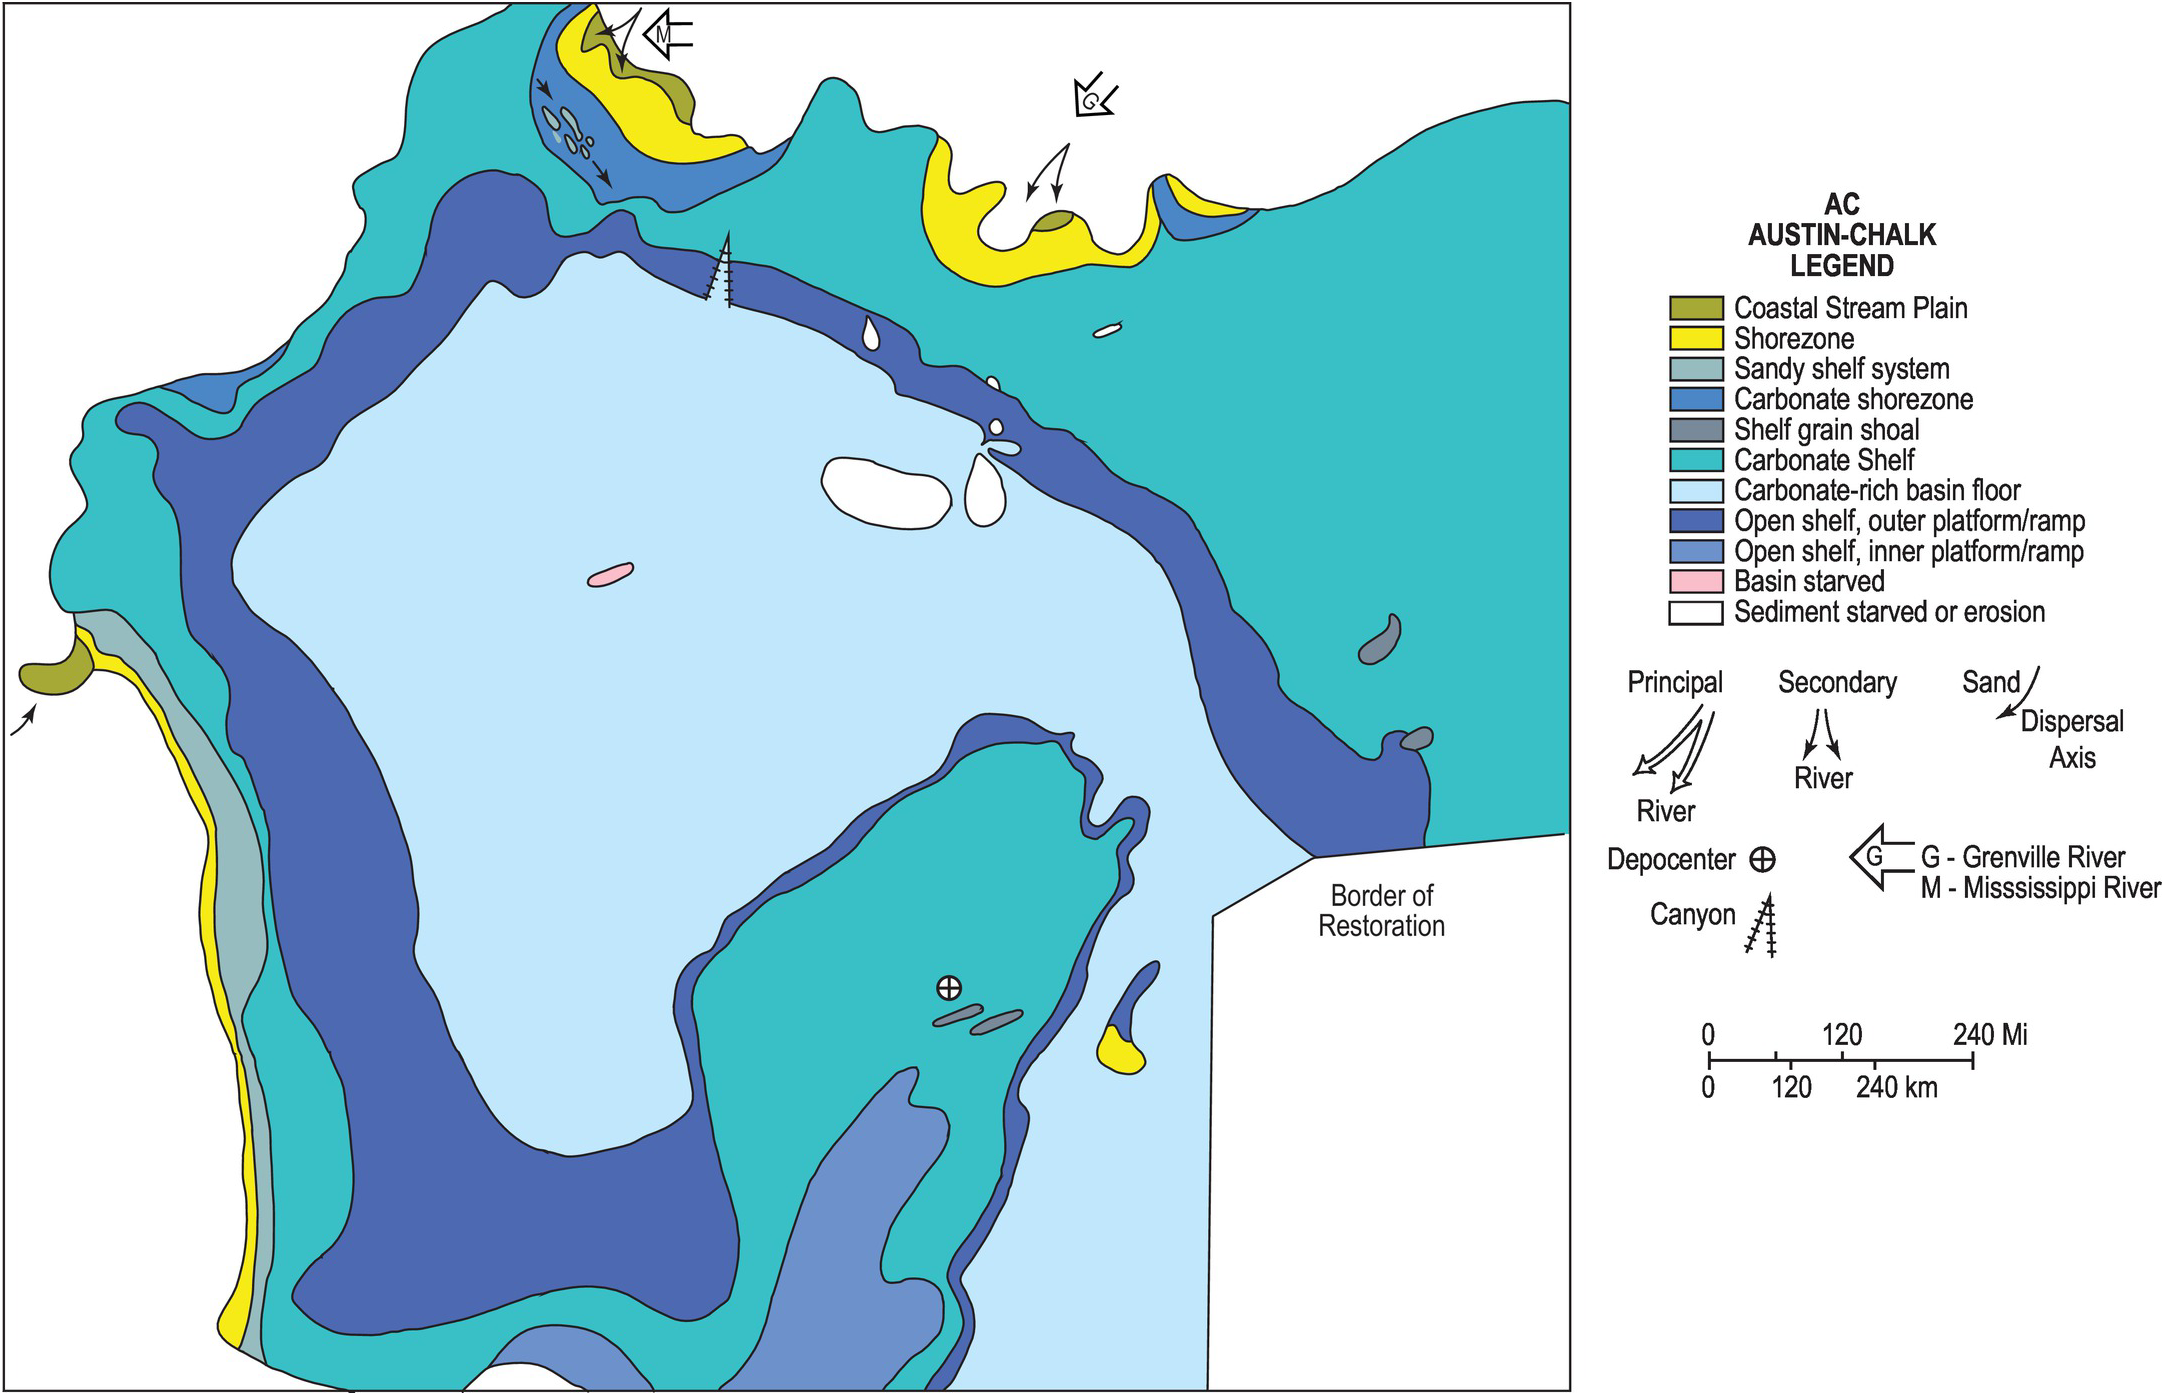 Mesozoic Depositional Evolution (Part II) - The Gulf of